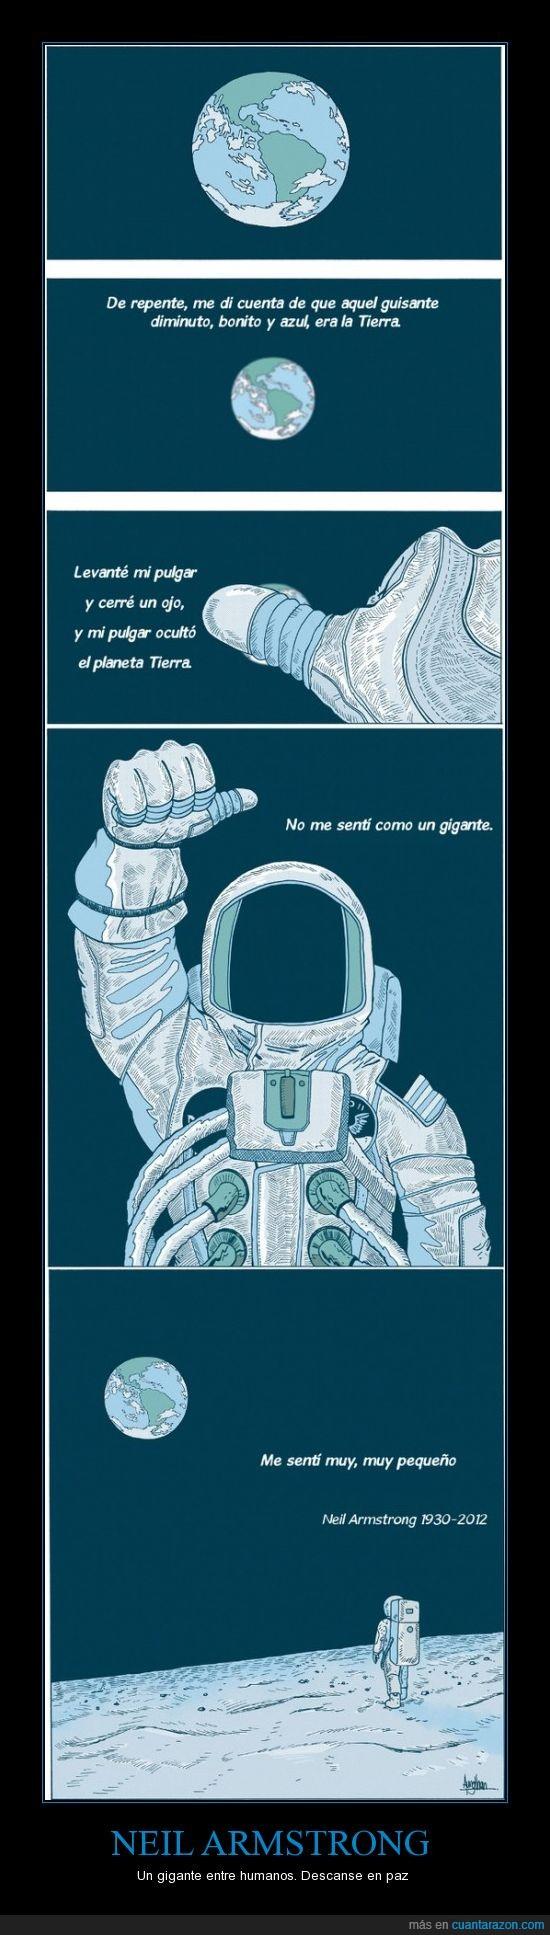 astronauta,luna,Neil Amstrong,viajar